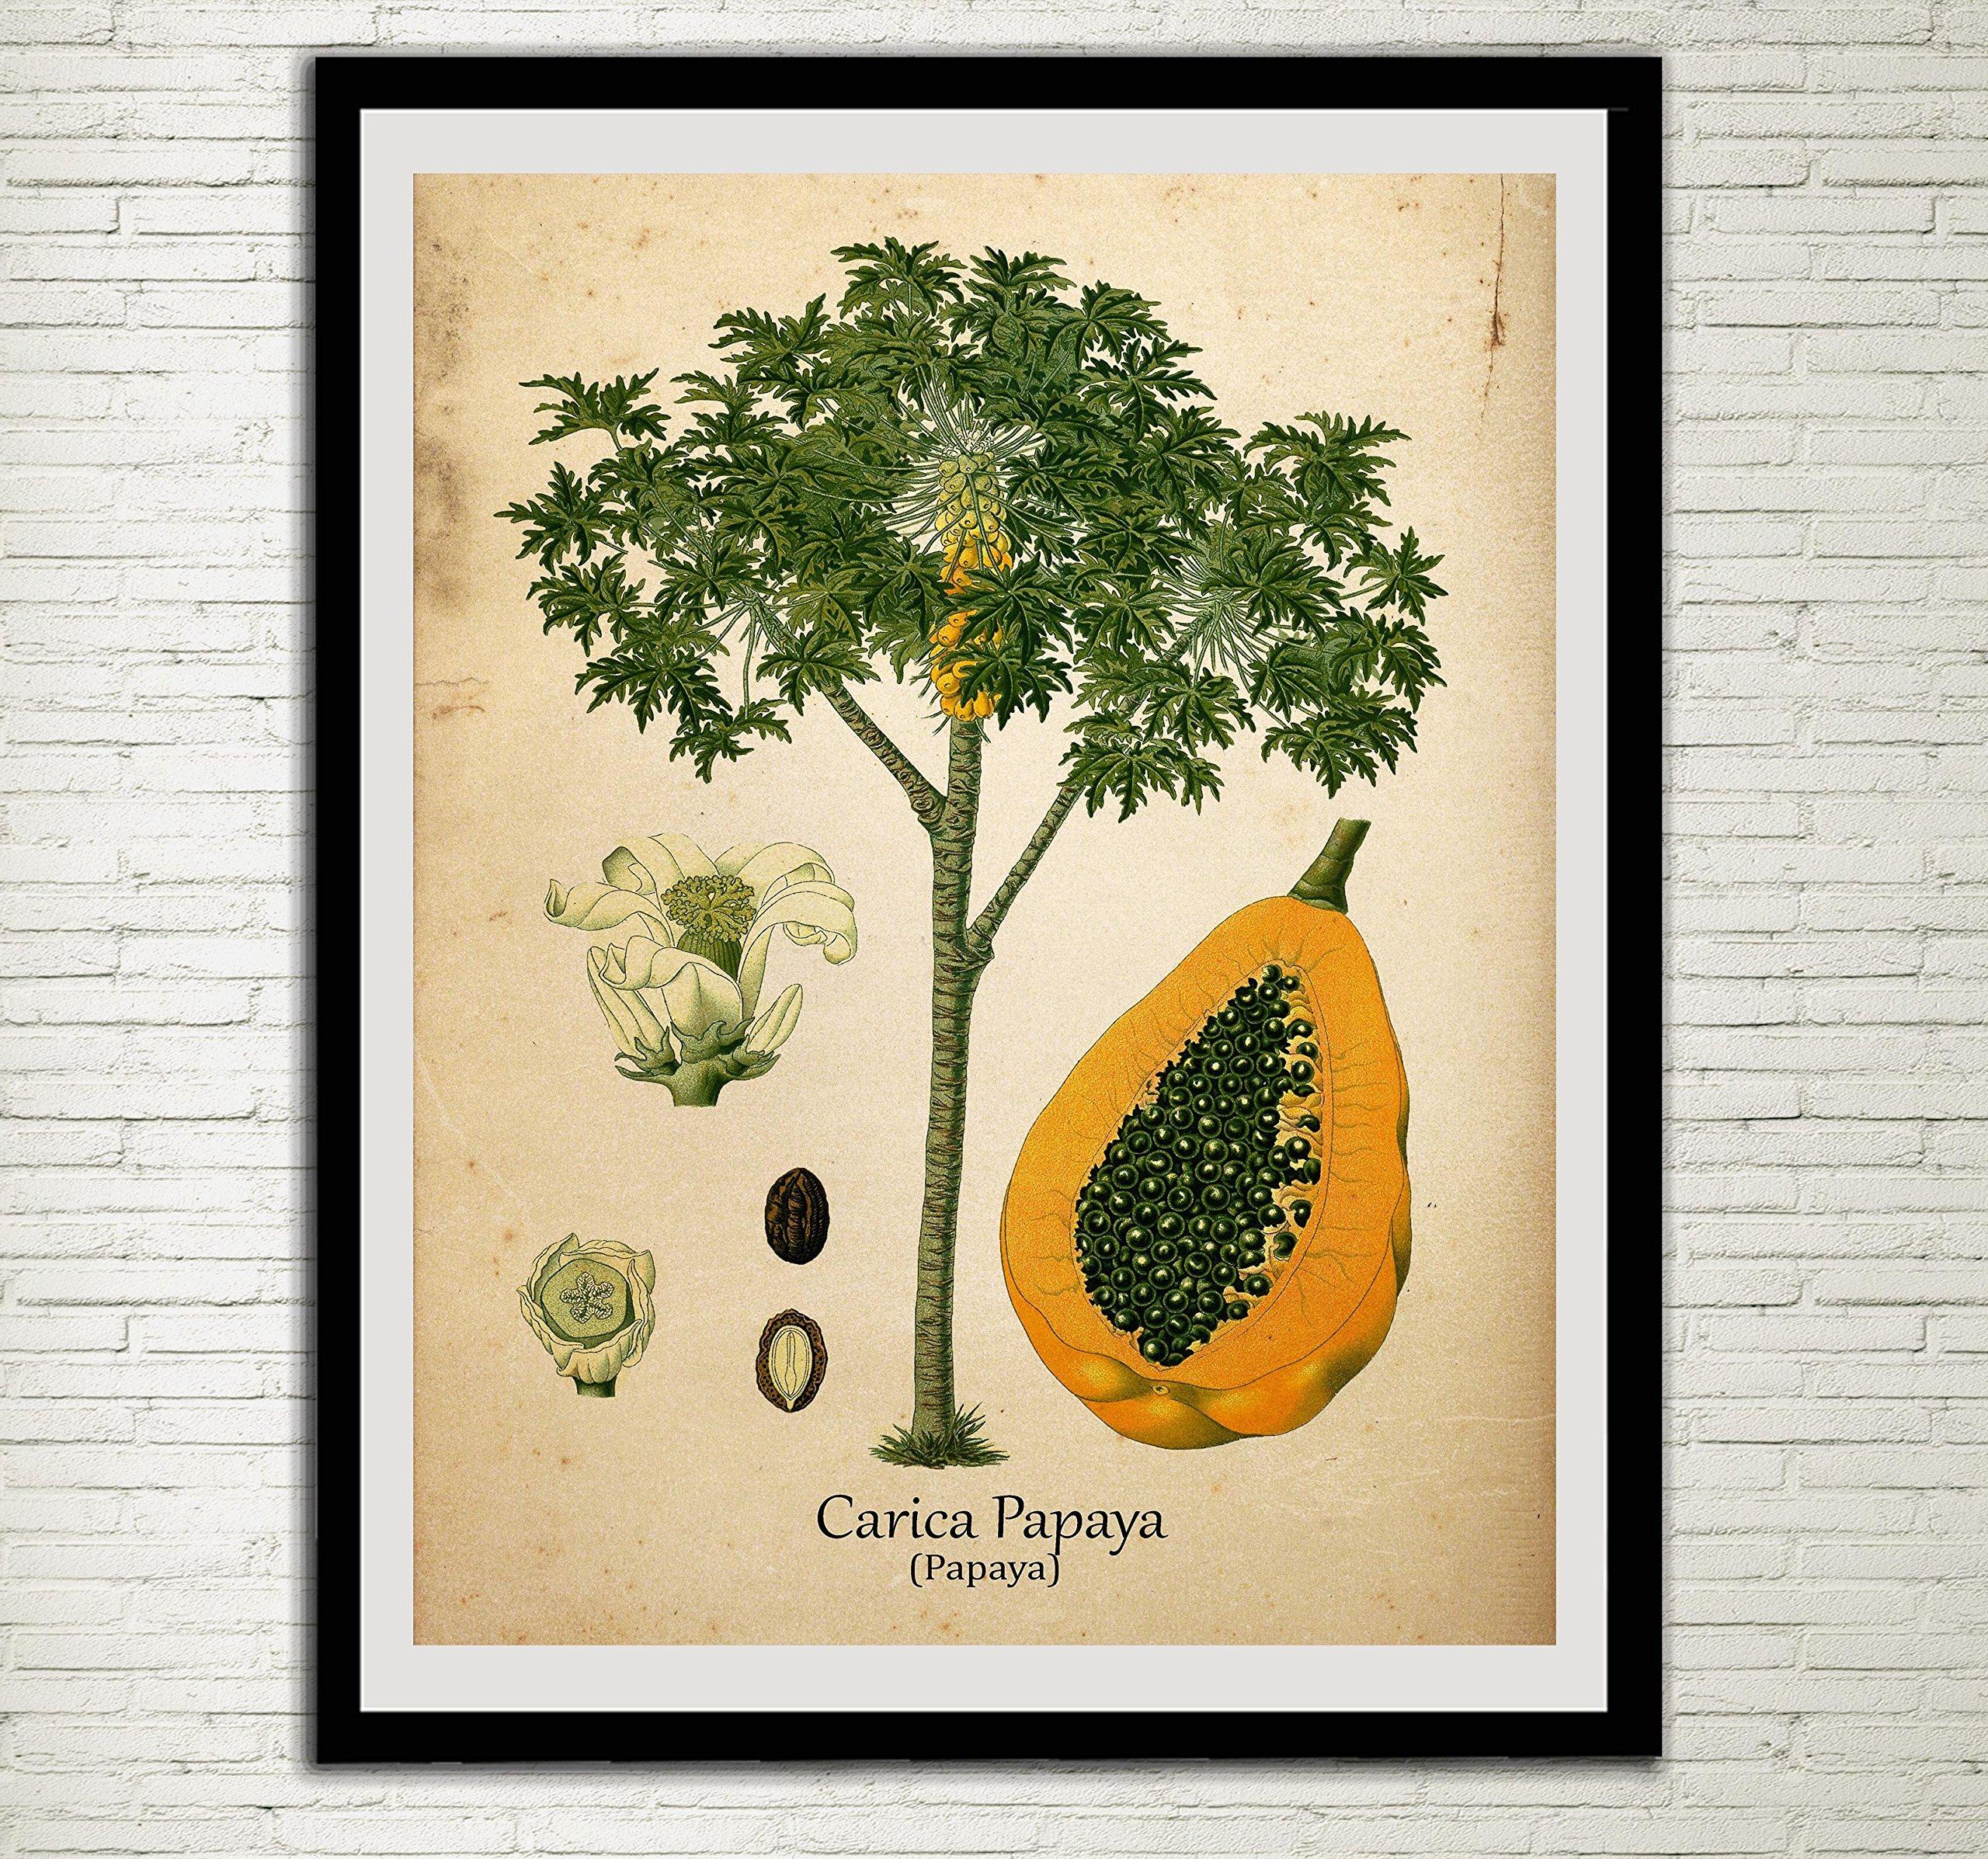 Papaya Vintage Print Set Herbs Wall Art Carica Papaya Antique Botanical Art Plants Kitchen Decor Buy Online In India At Desertcart In Productid 57168152